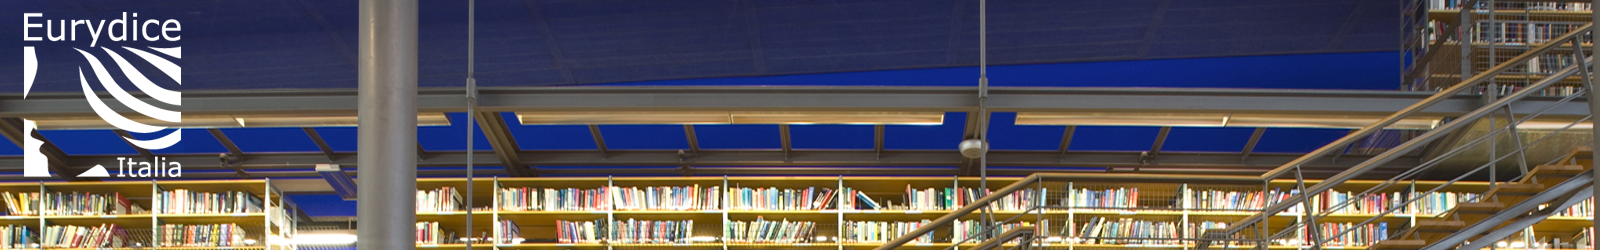 logo eurydice sullo sfondo di una biblioteca